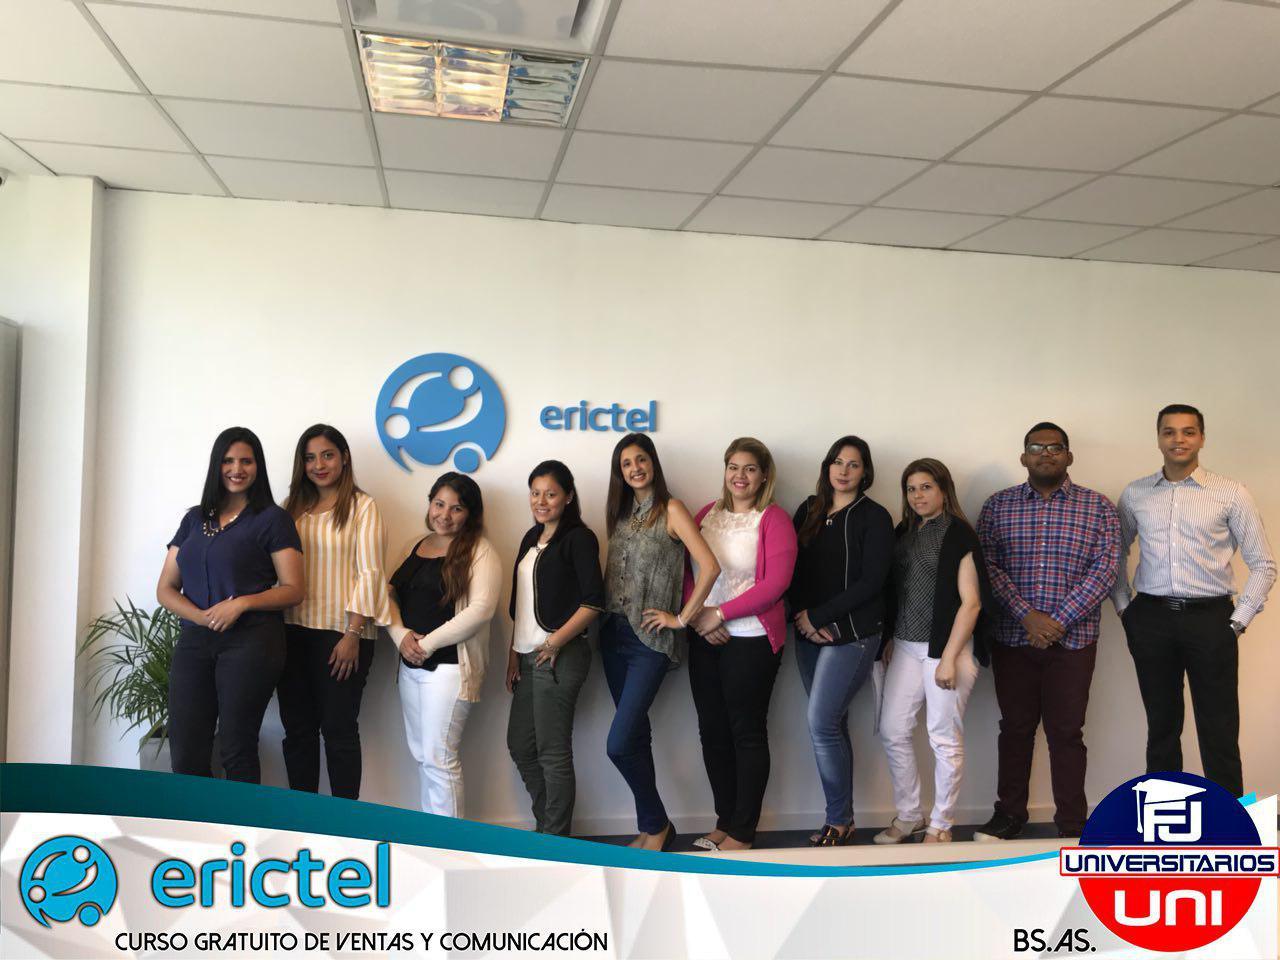 Proyecto Universitarios + Erictel